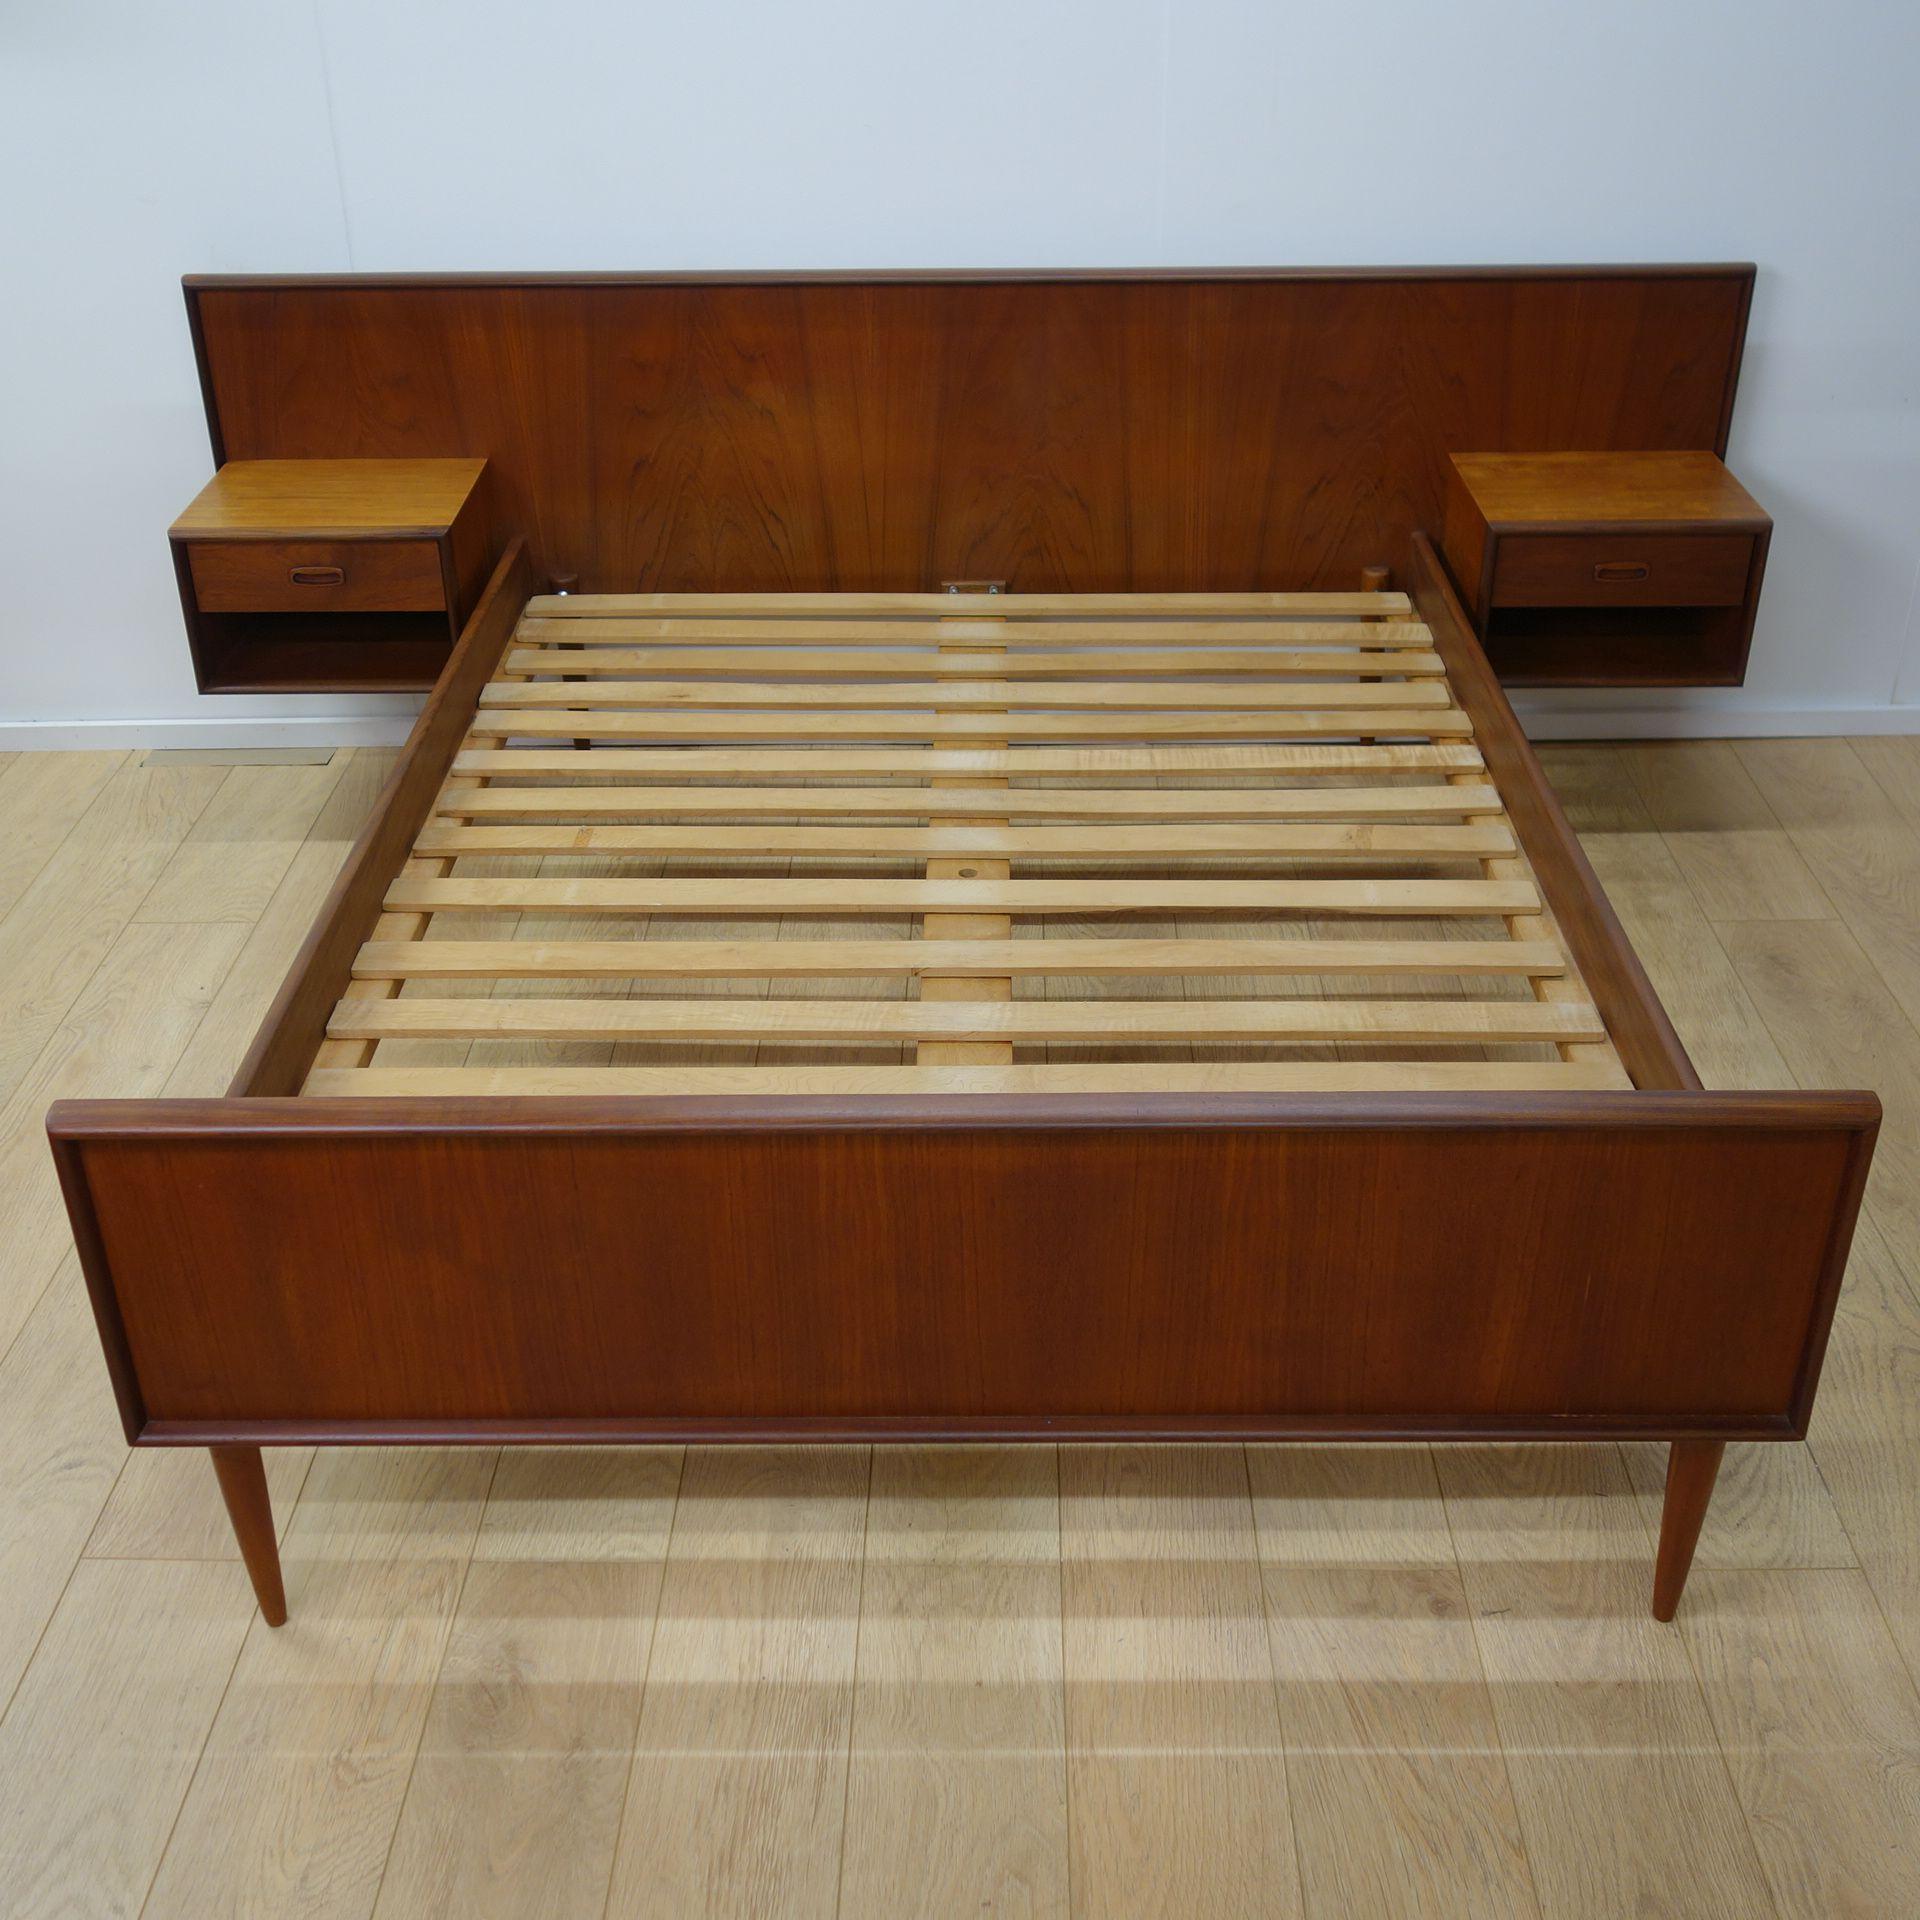 Buy Retro Danish Teak Double Bed Mark Parrish